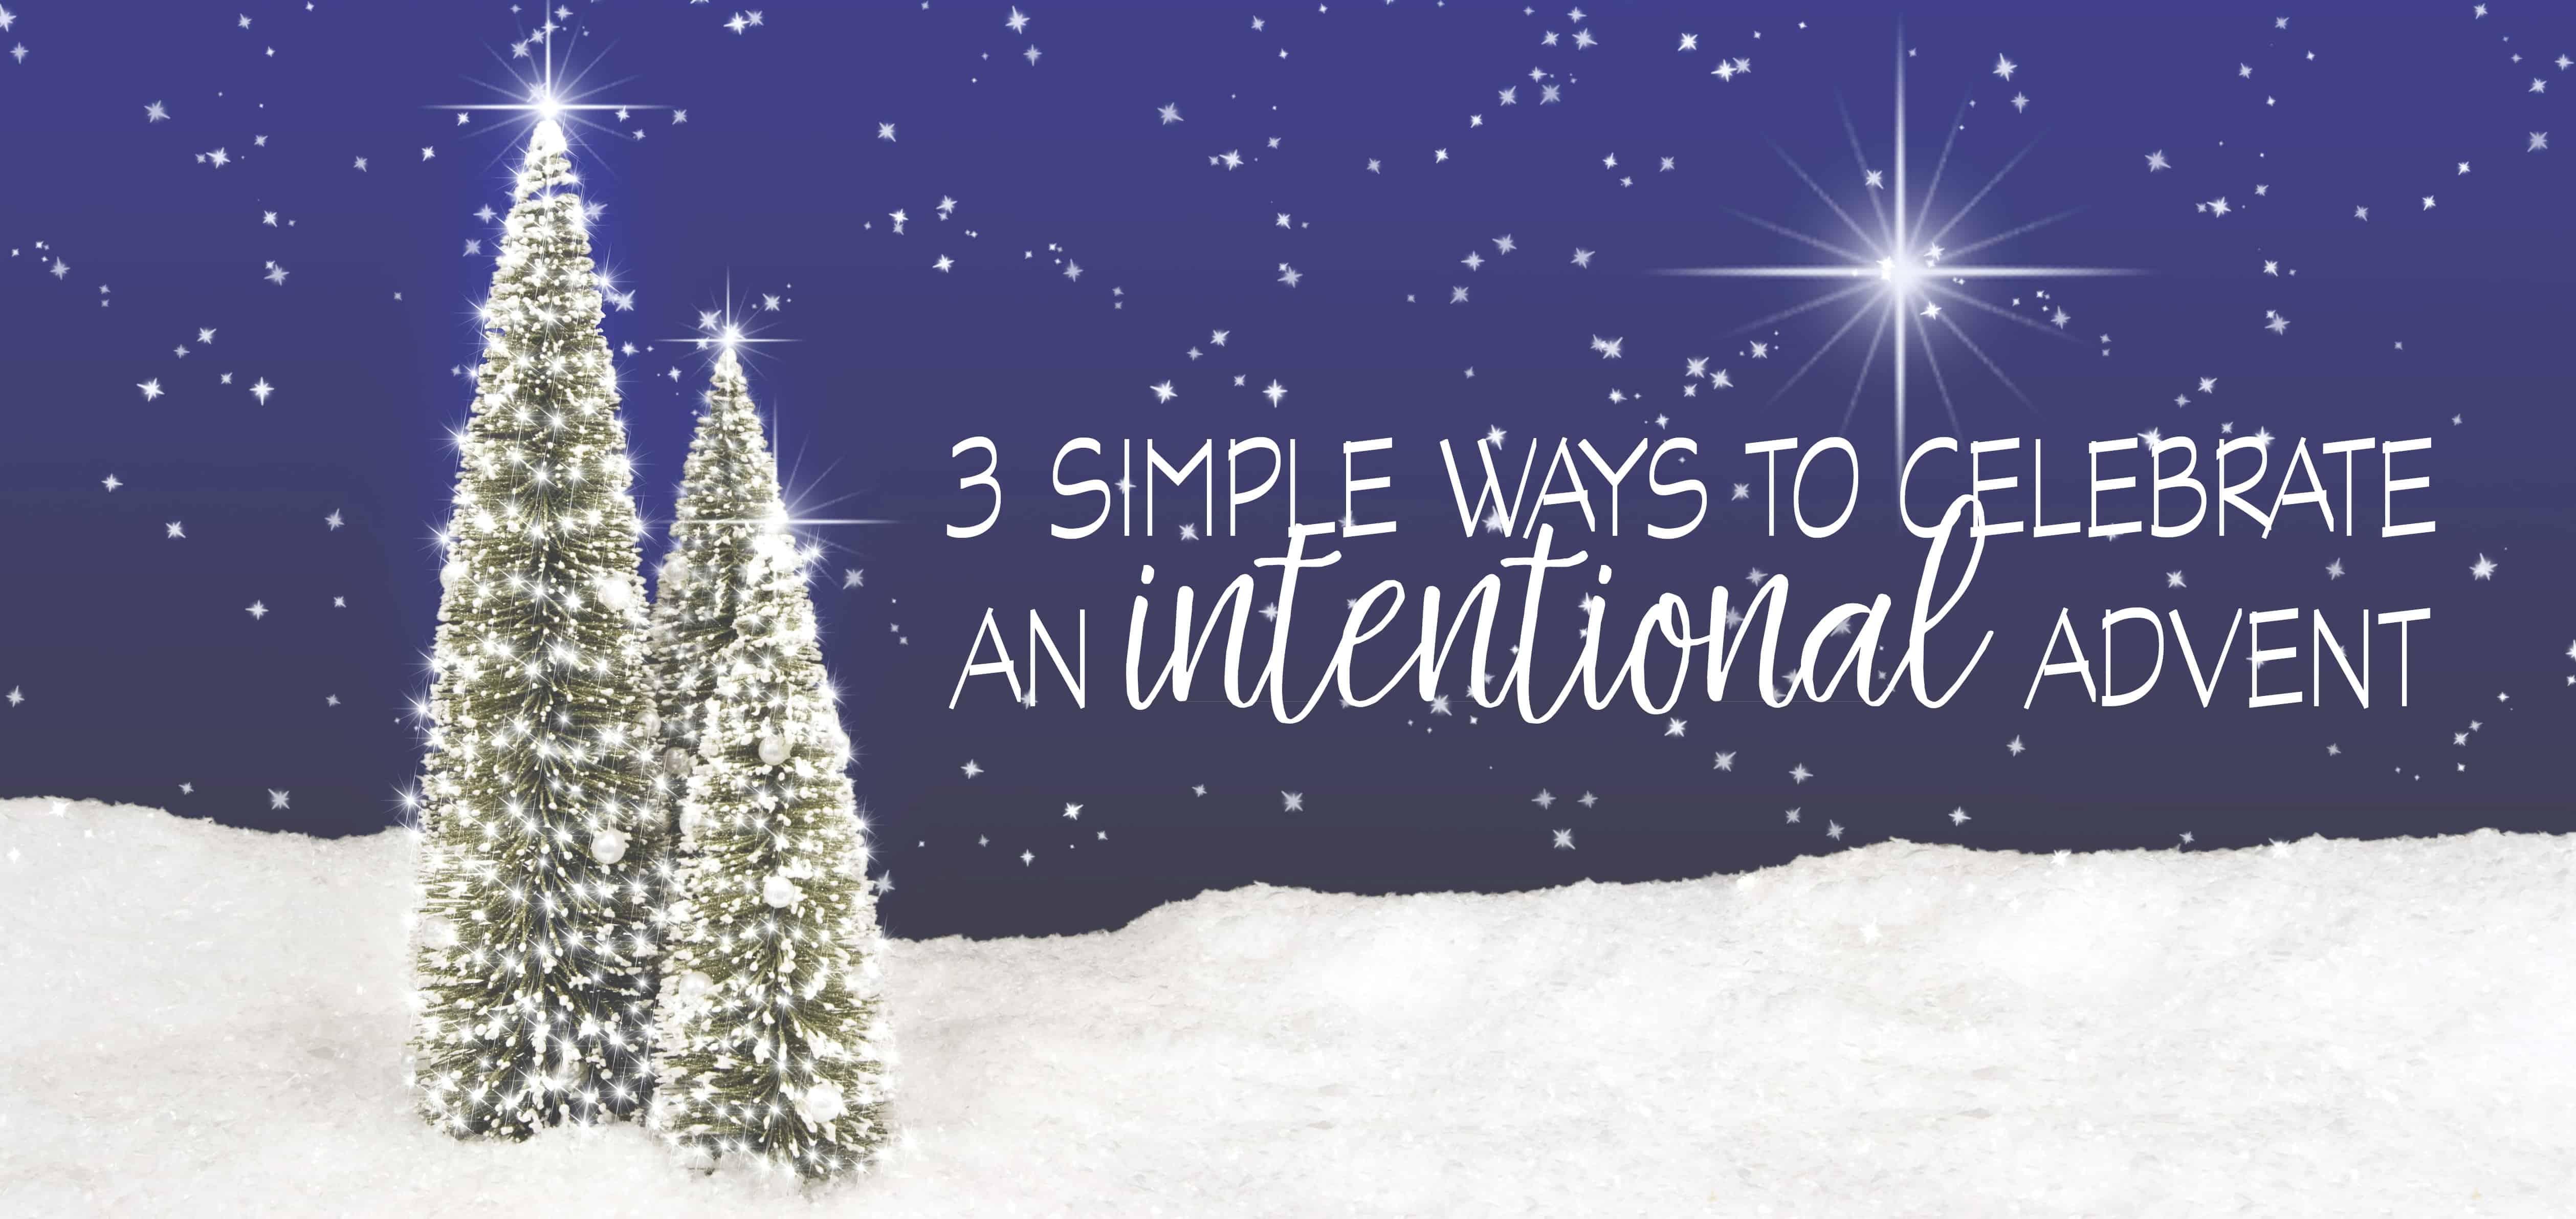 An Intentional Advent